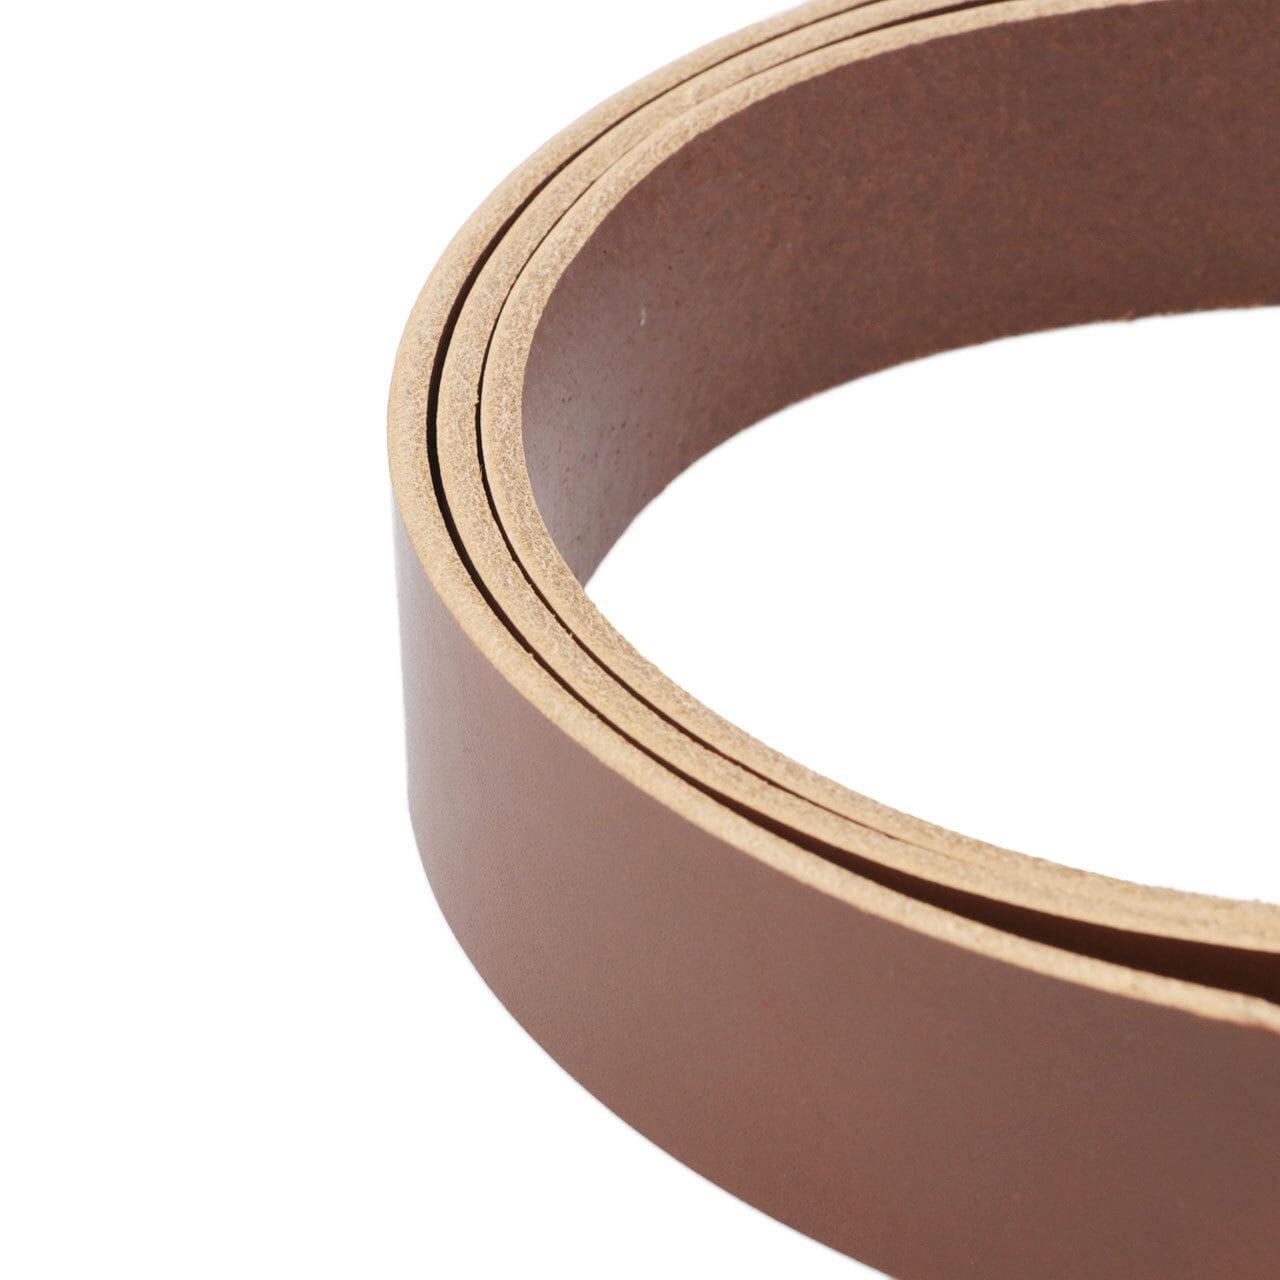 INGRASSATO / イングラサット ベルトカット革 35mm幅 素材 イタリア革